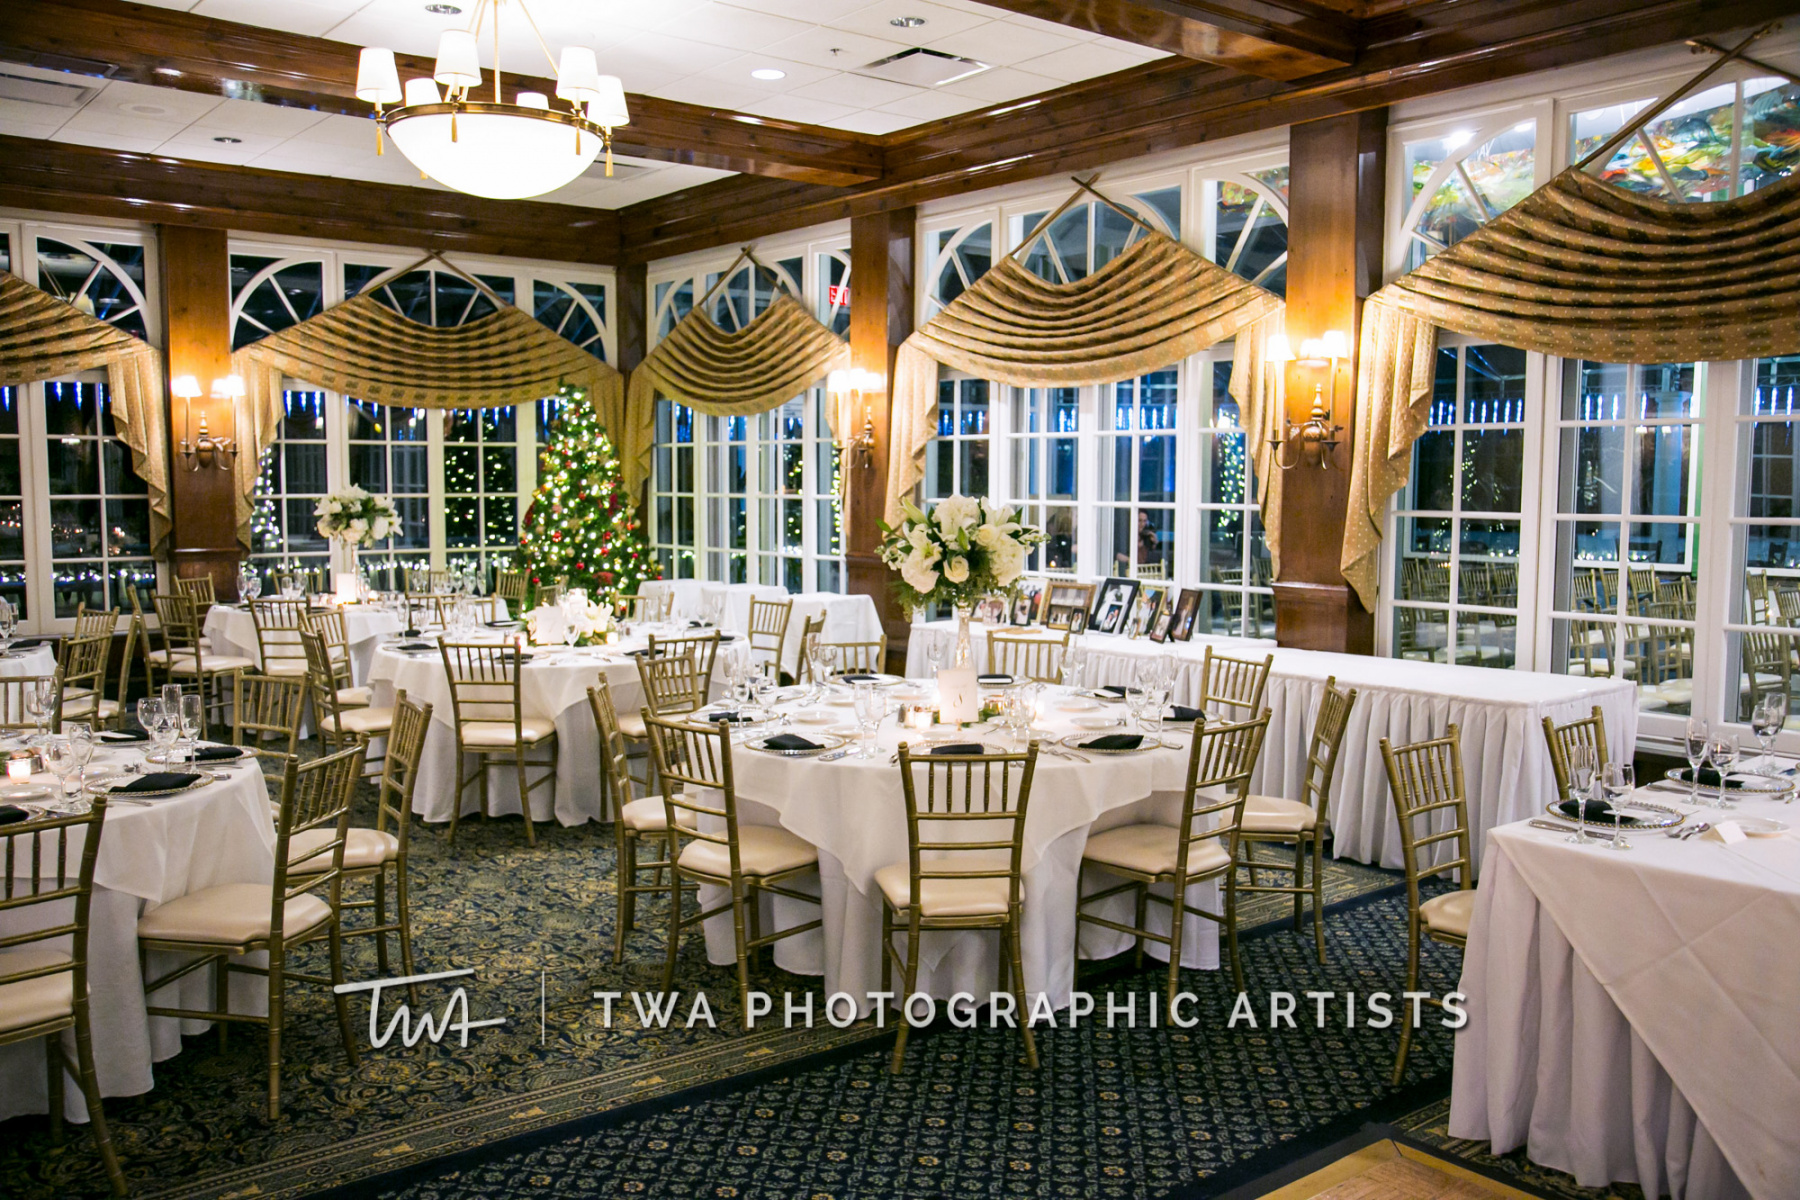 Chicago-Wedding-Photographer-TWA-Photographic-Artists-Drake-Oak-Brook_Bartlett_Najac_TL_CM-0744